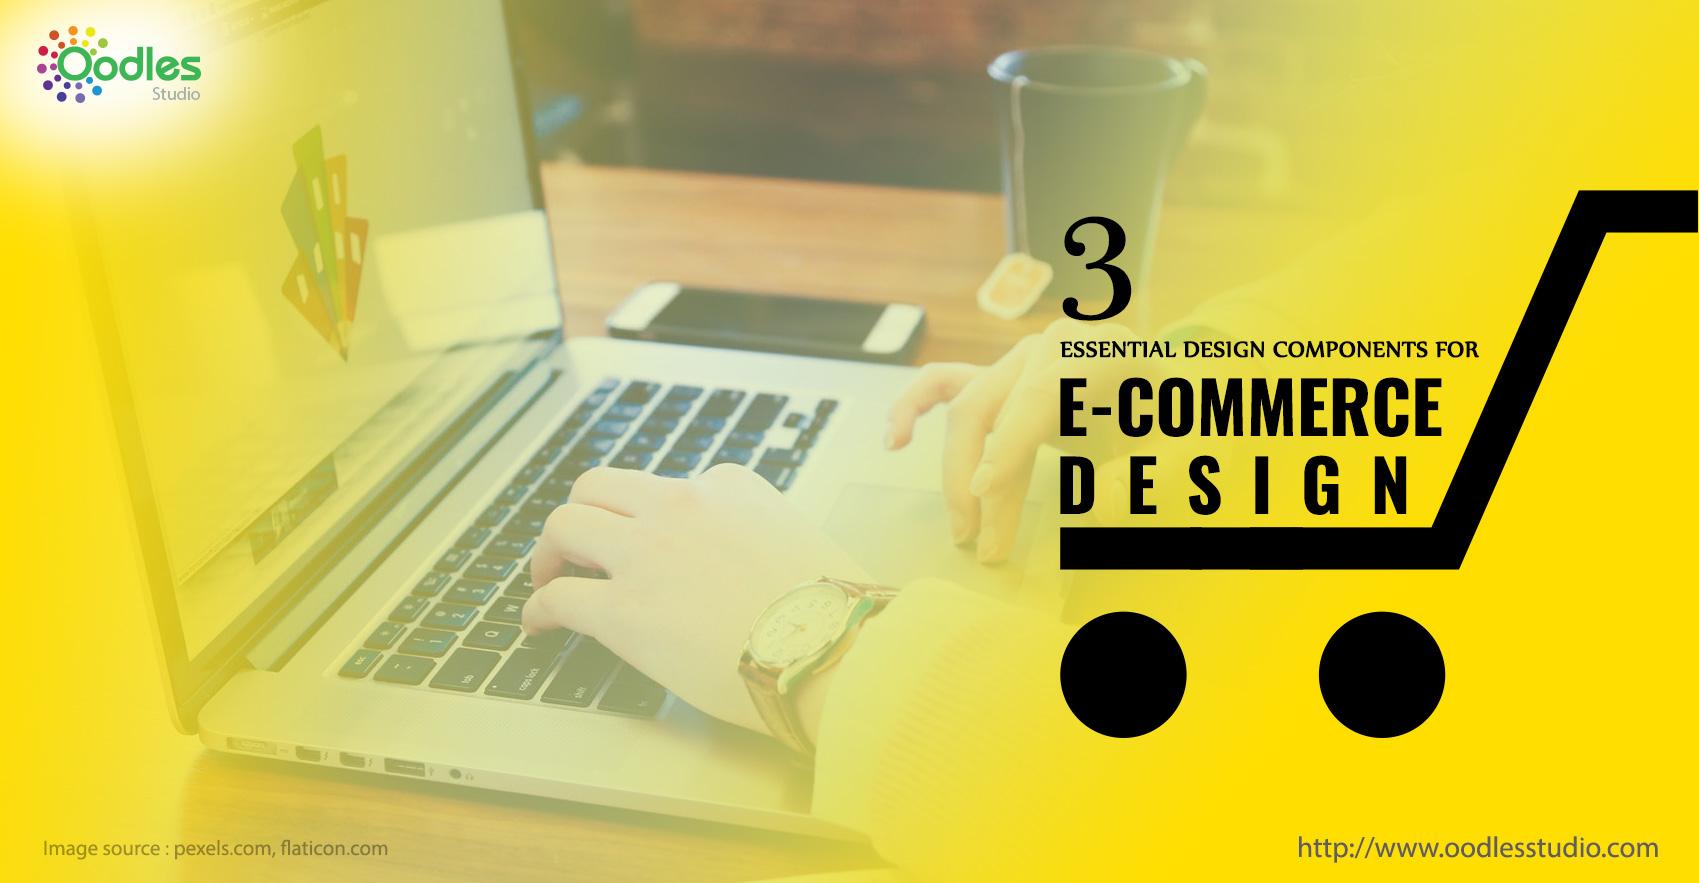 basic design components of an e-commerce website